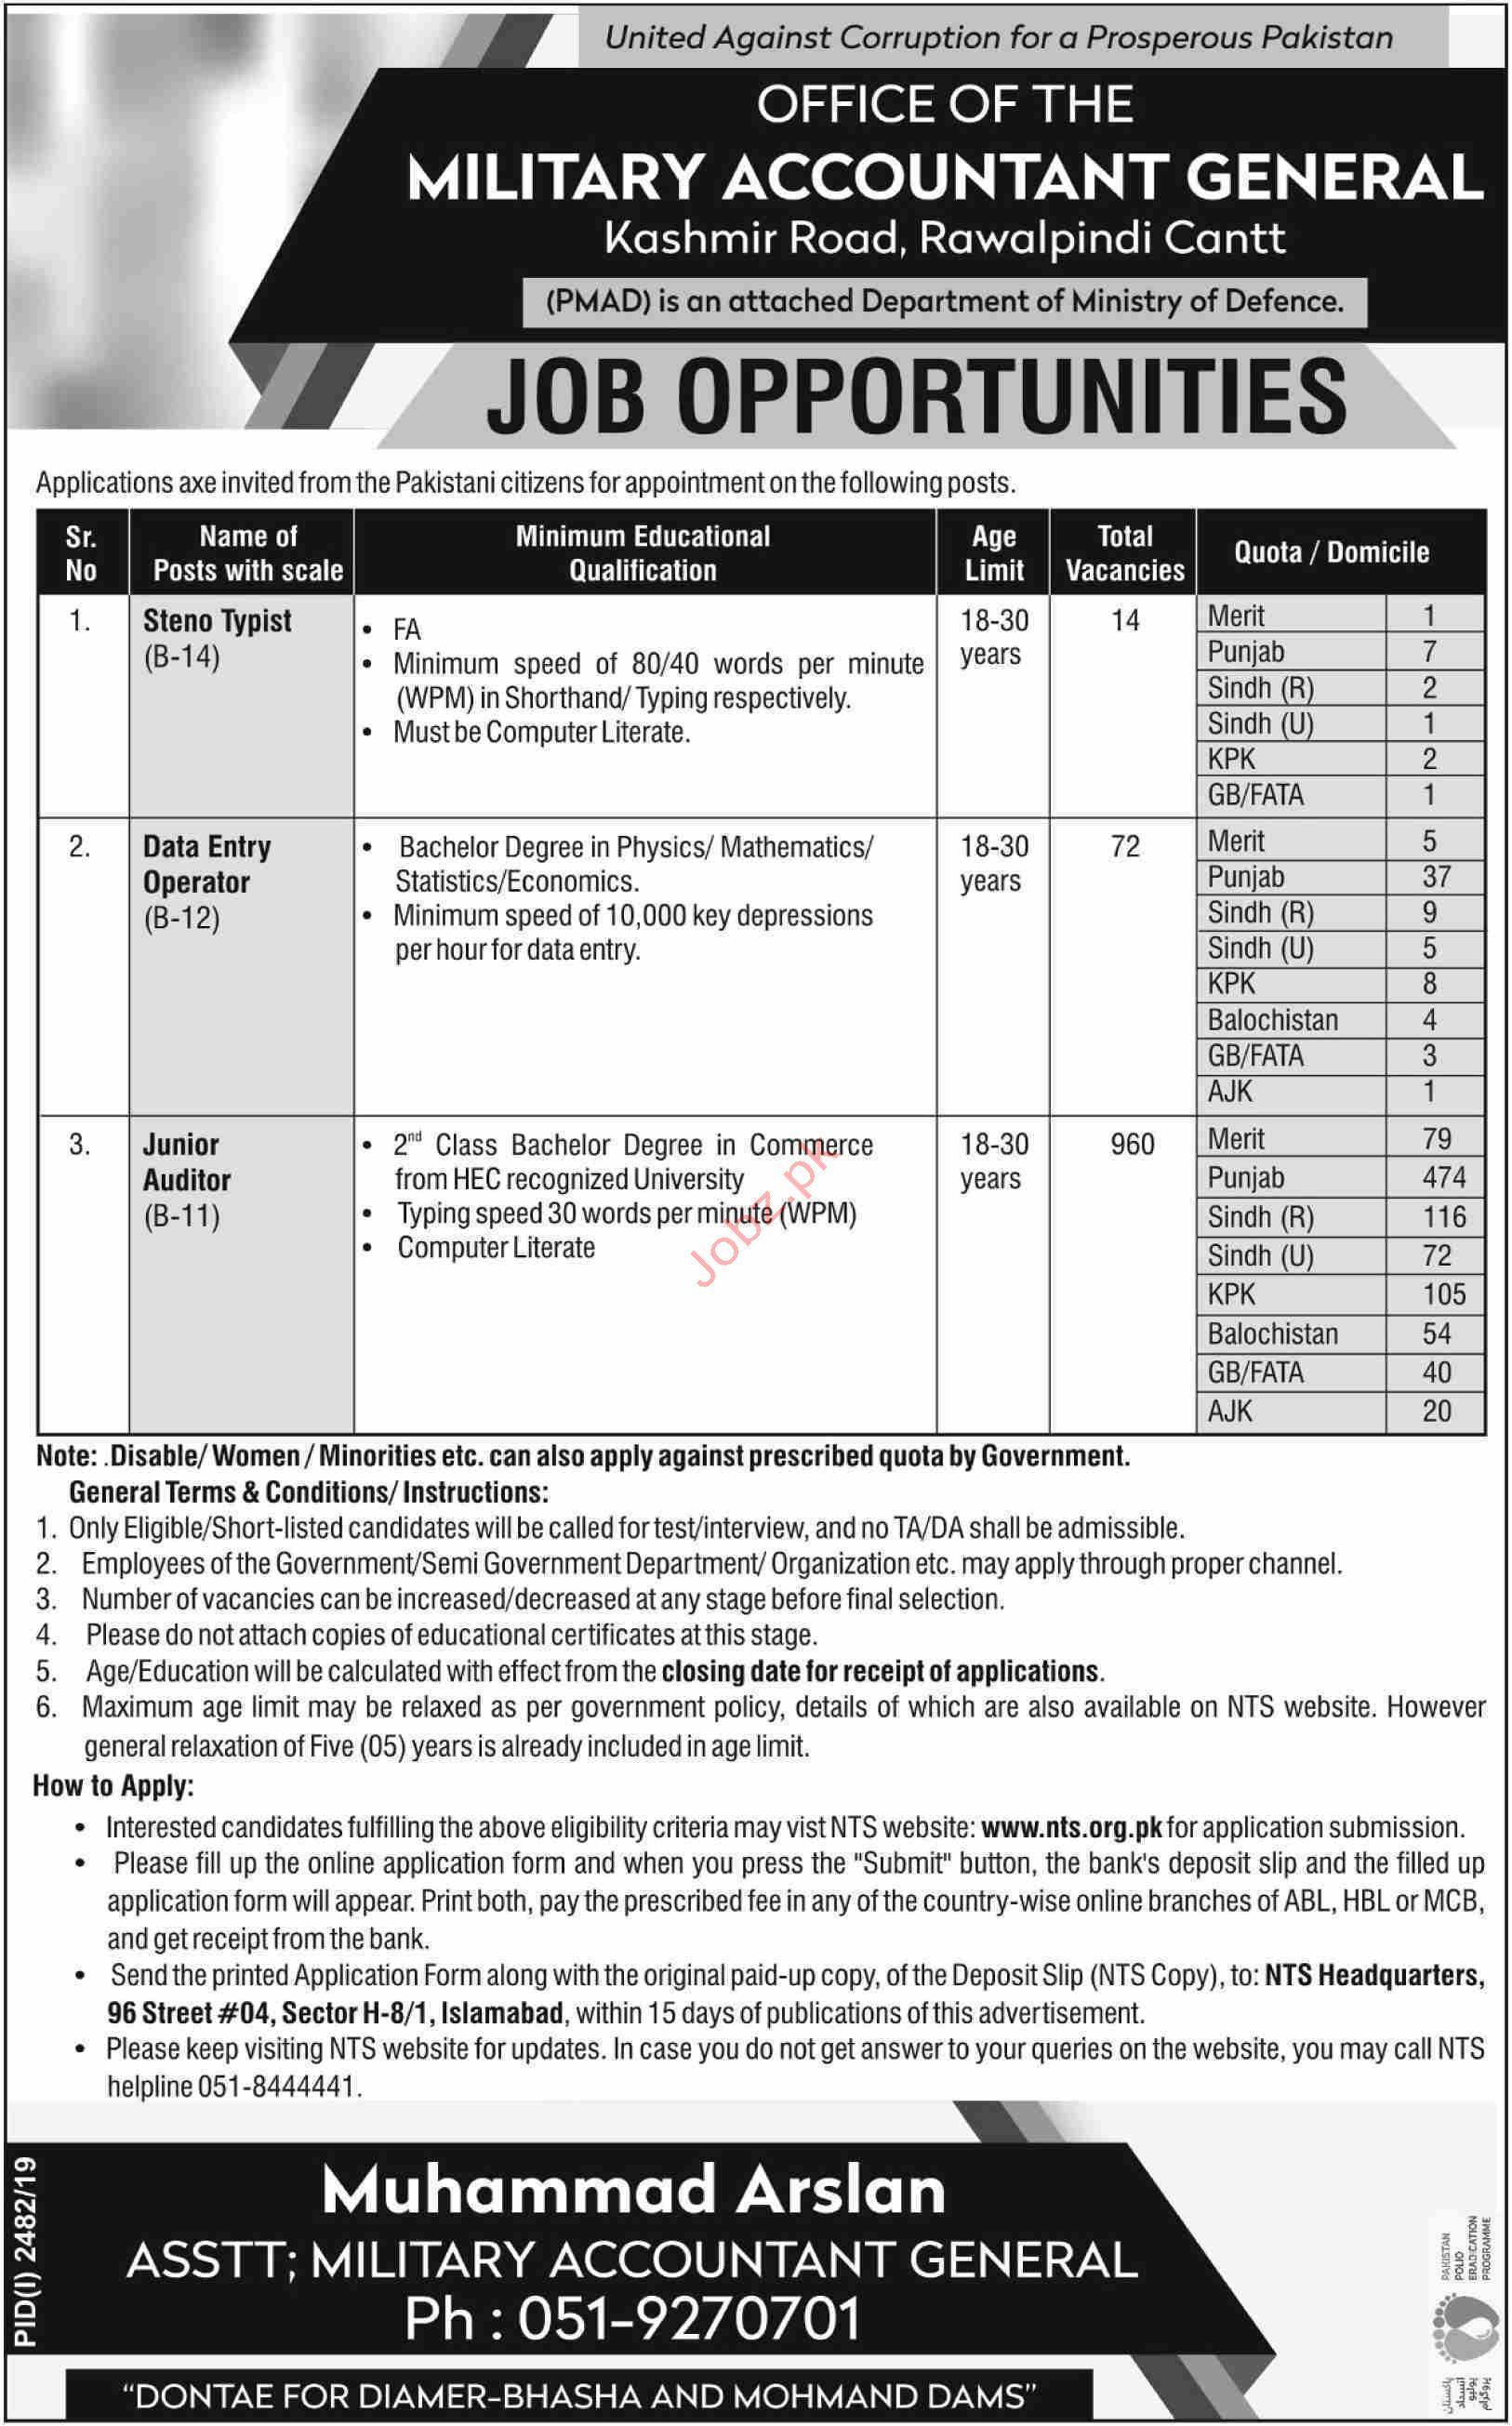 Military Accountant General Rawalpindi Cantt Jobs via NTS